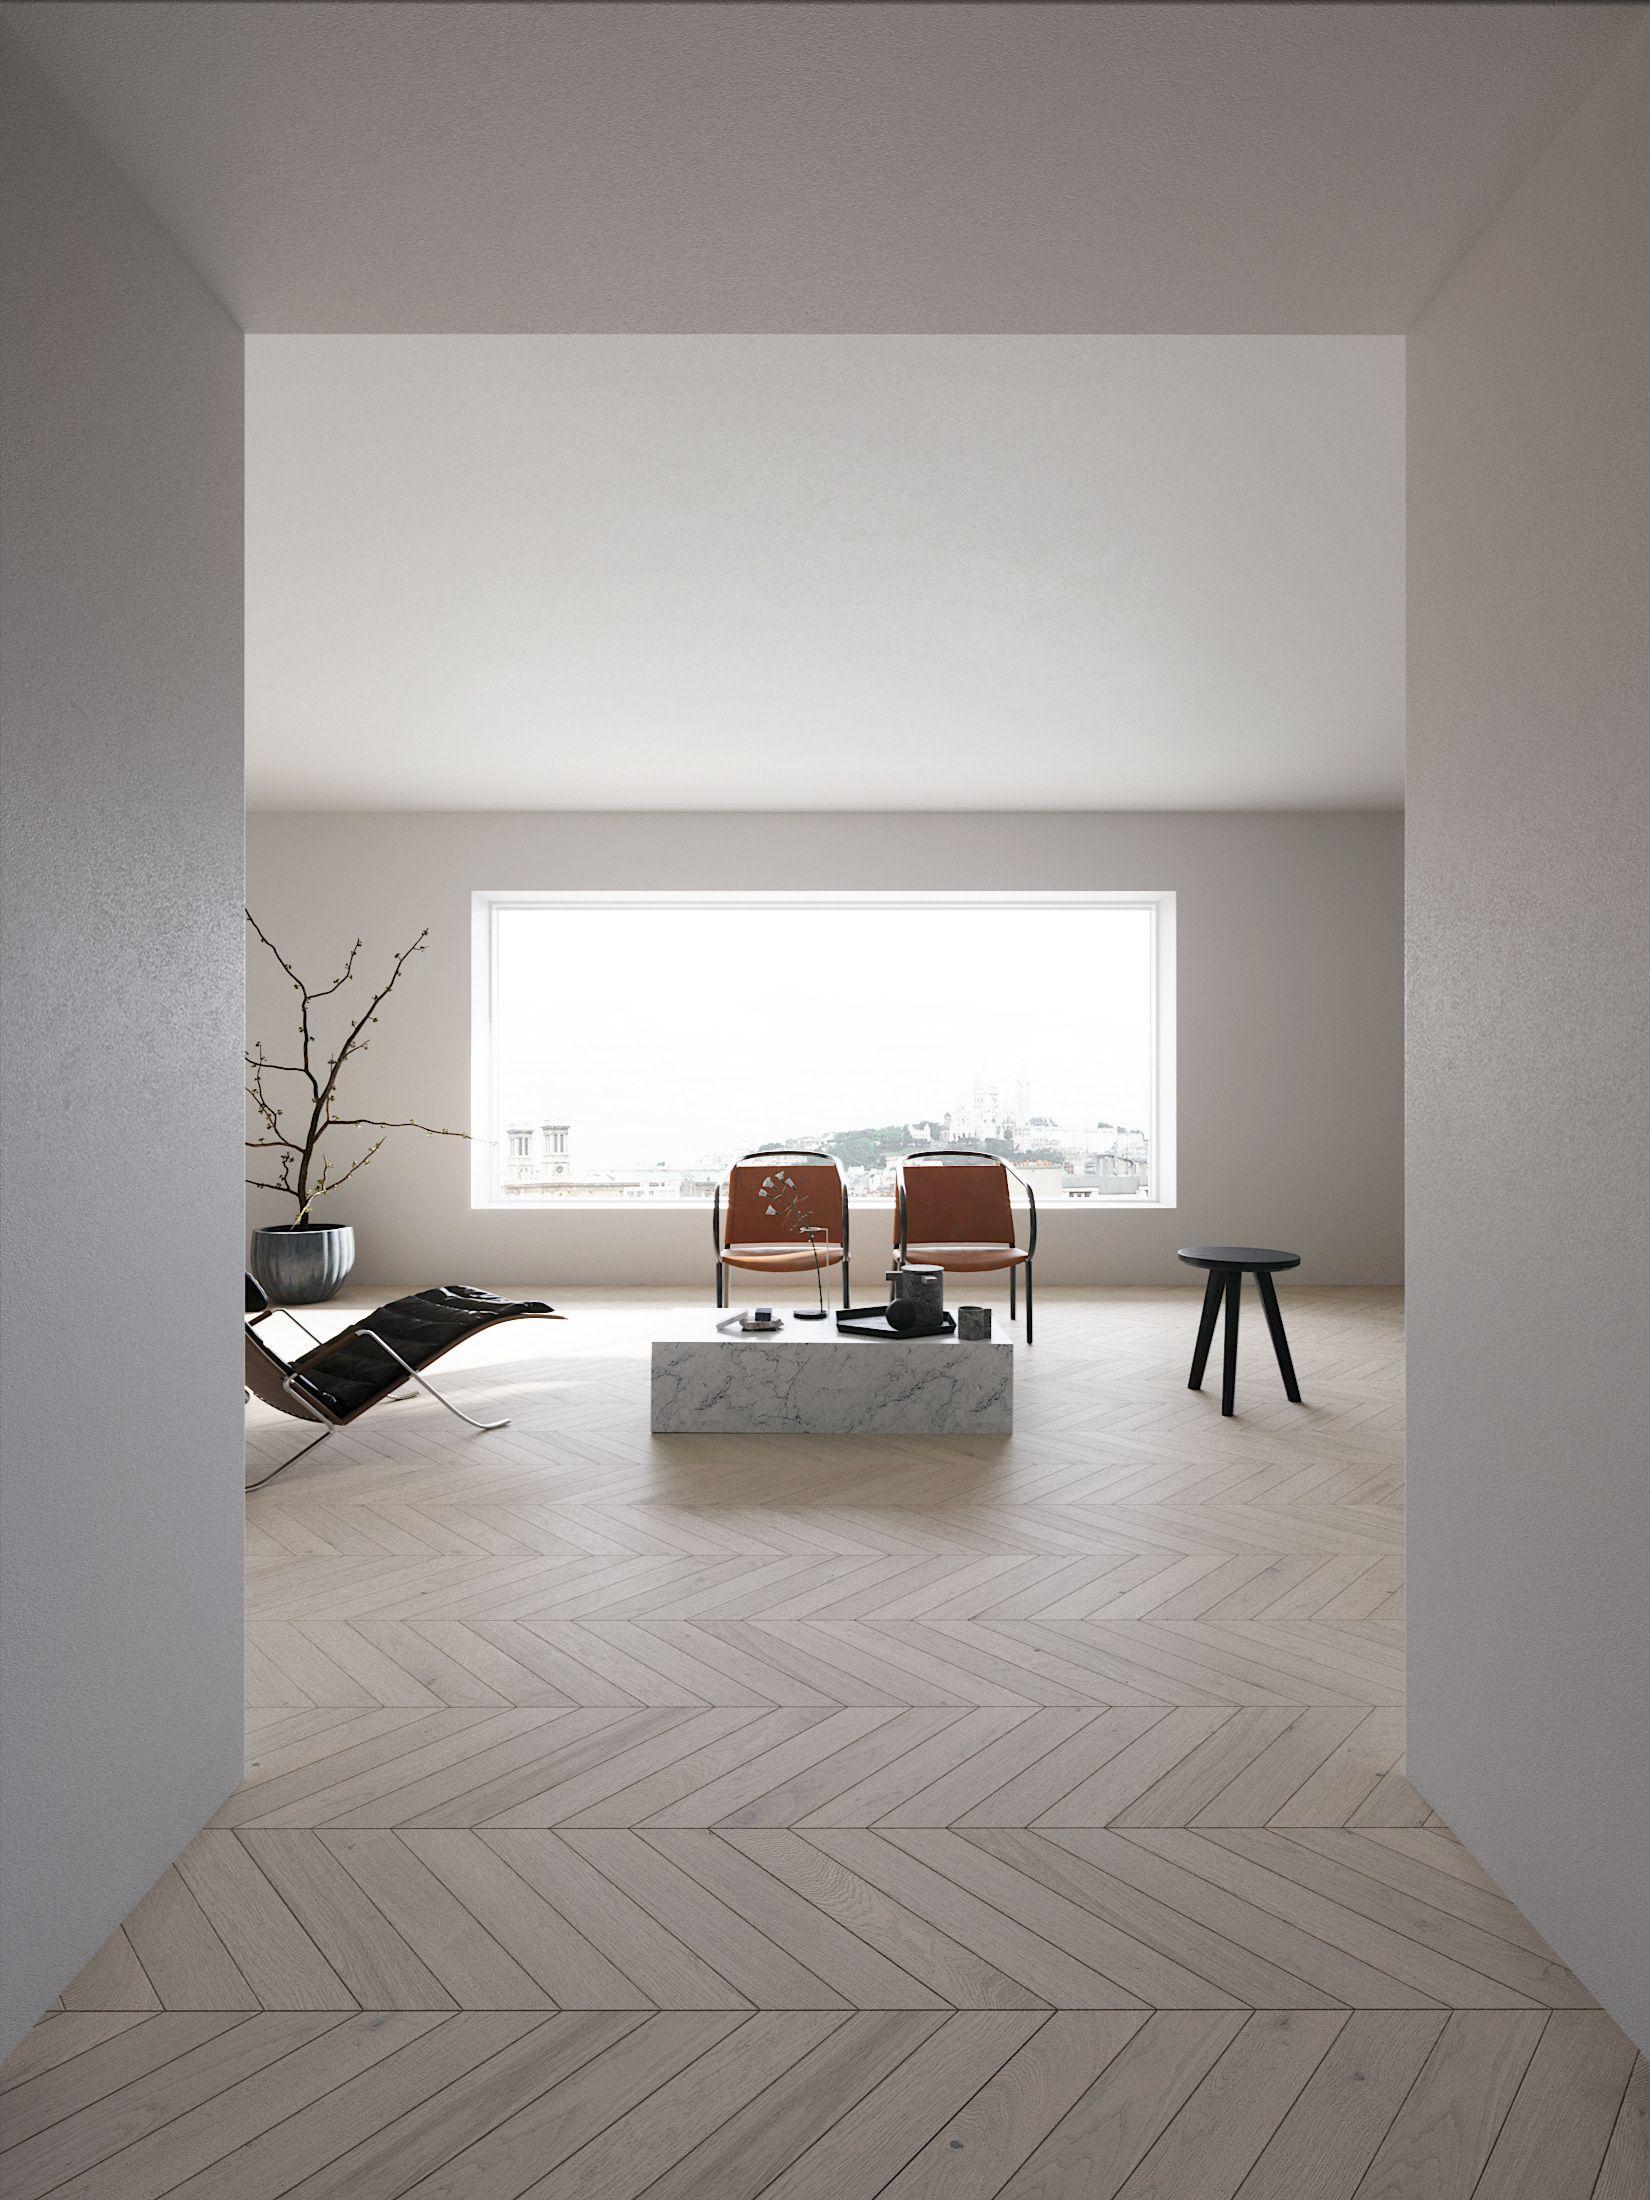 Minimalism Minimalist Interior Design With All White